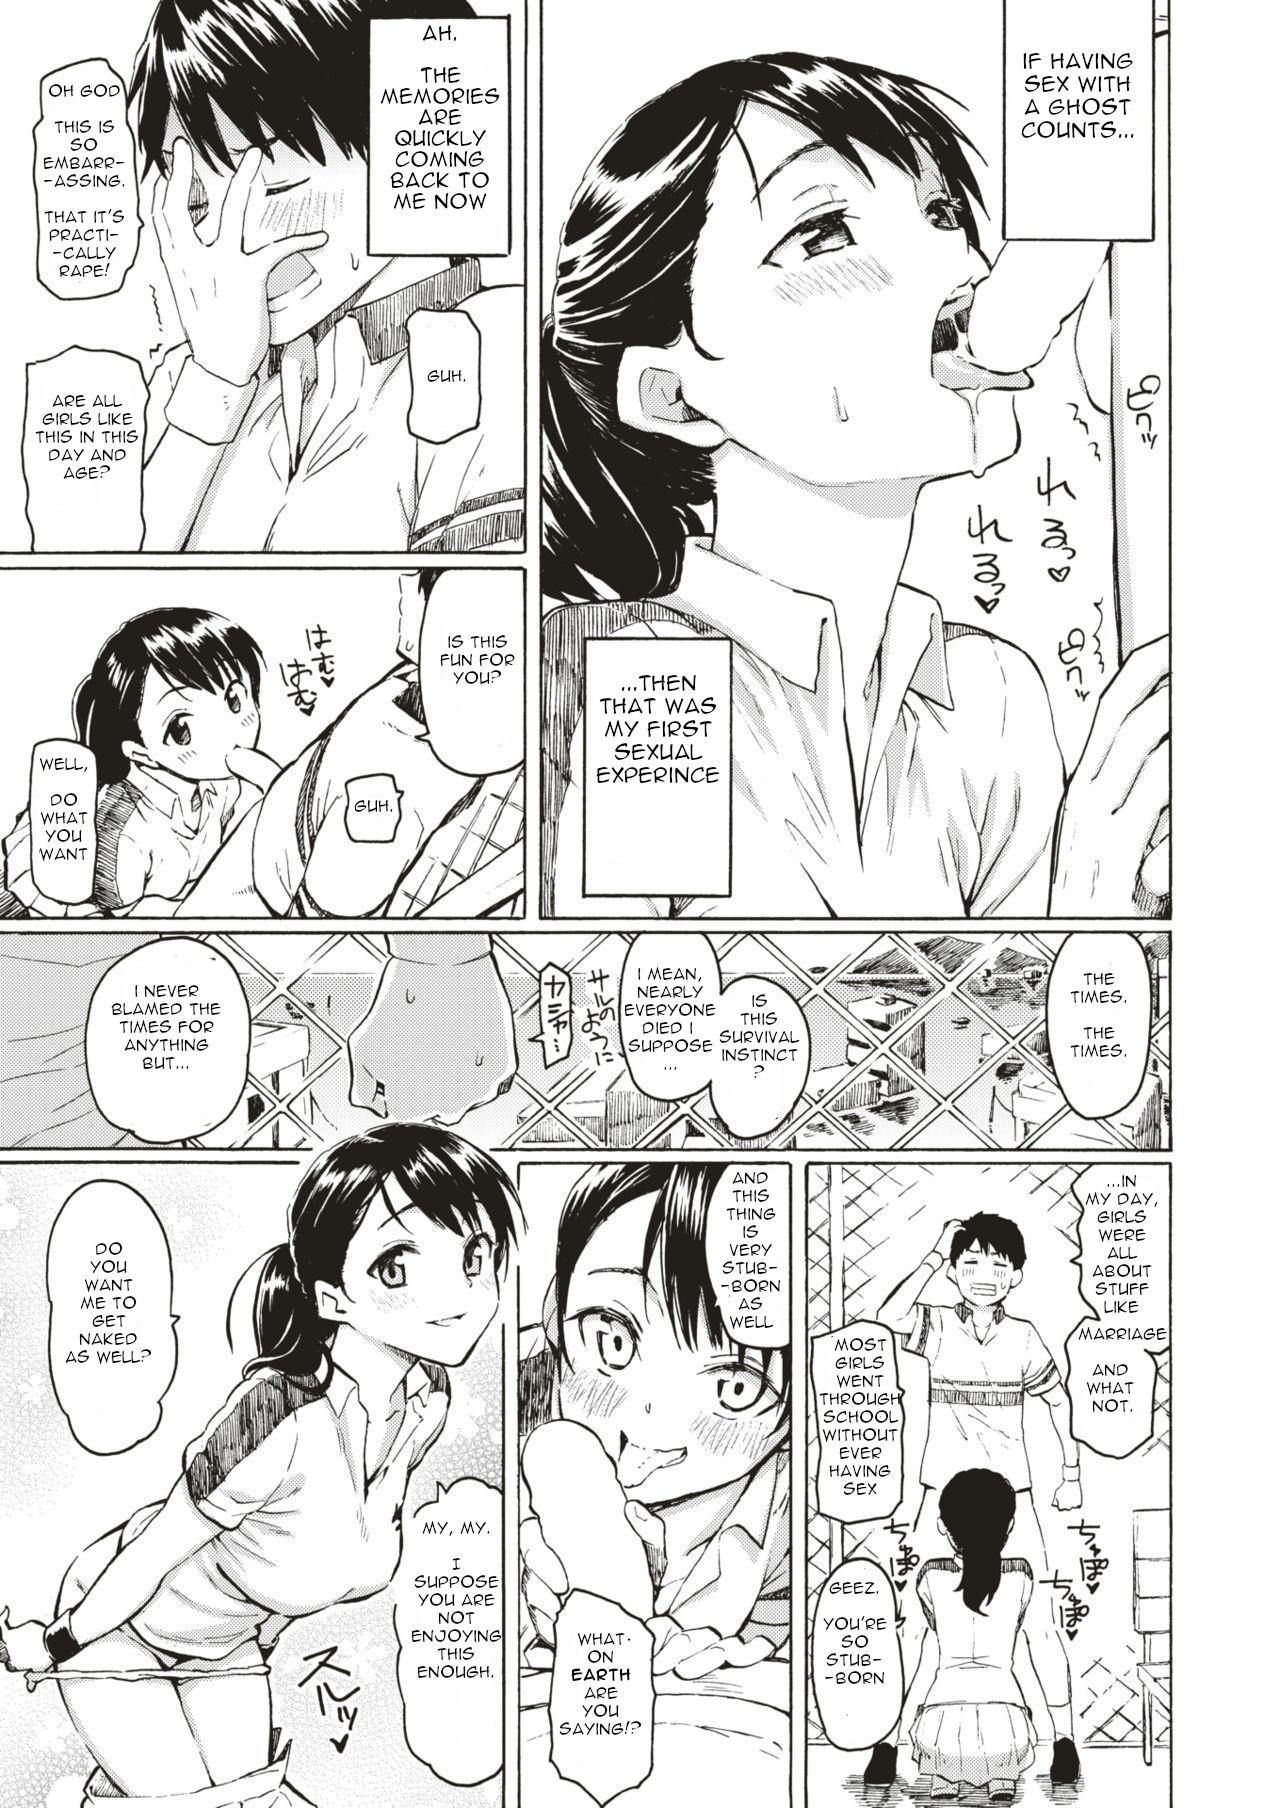 Kyouka no Niwa 4